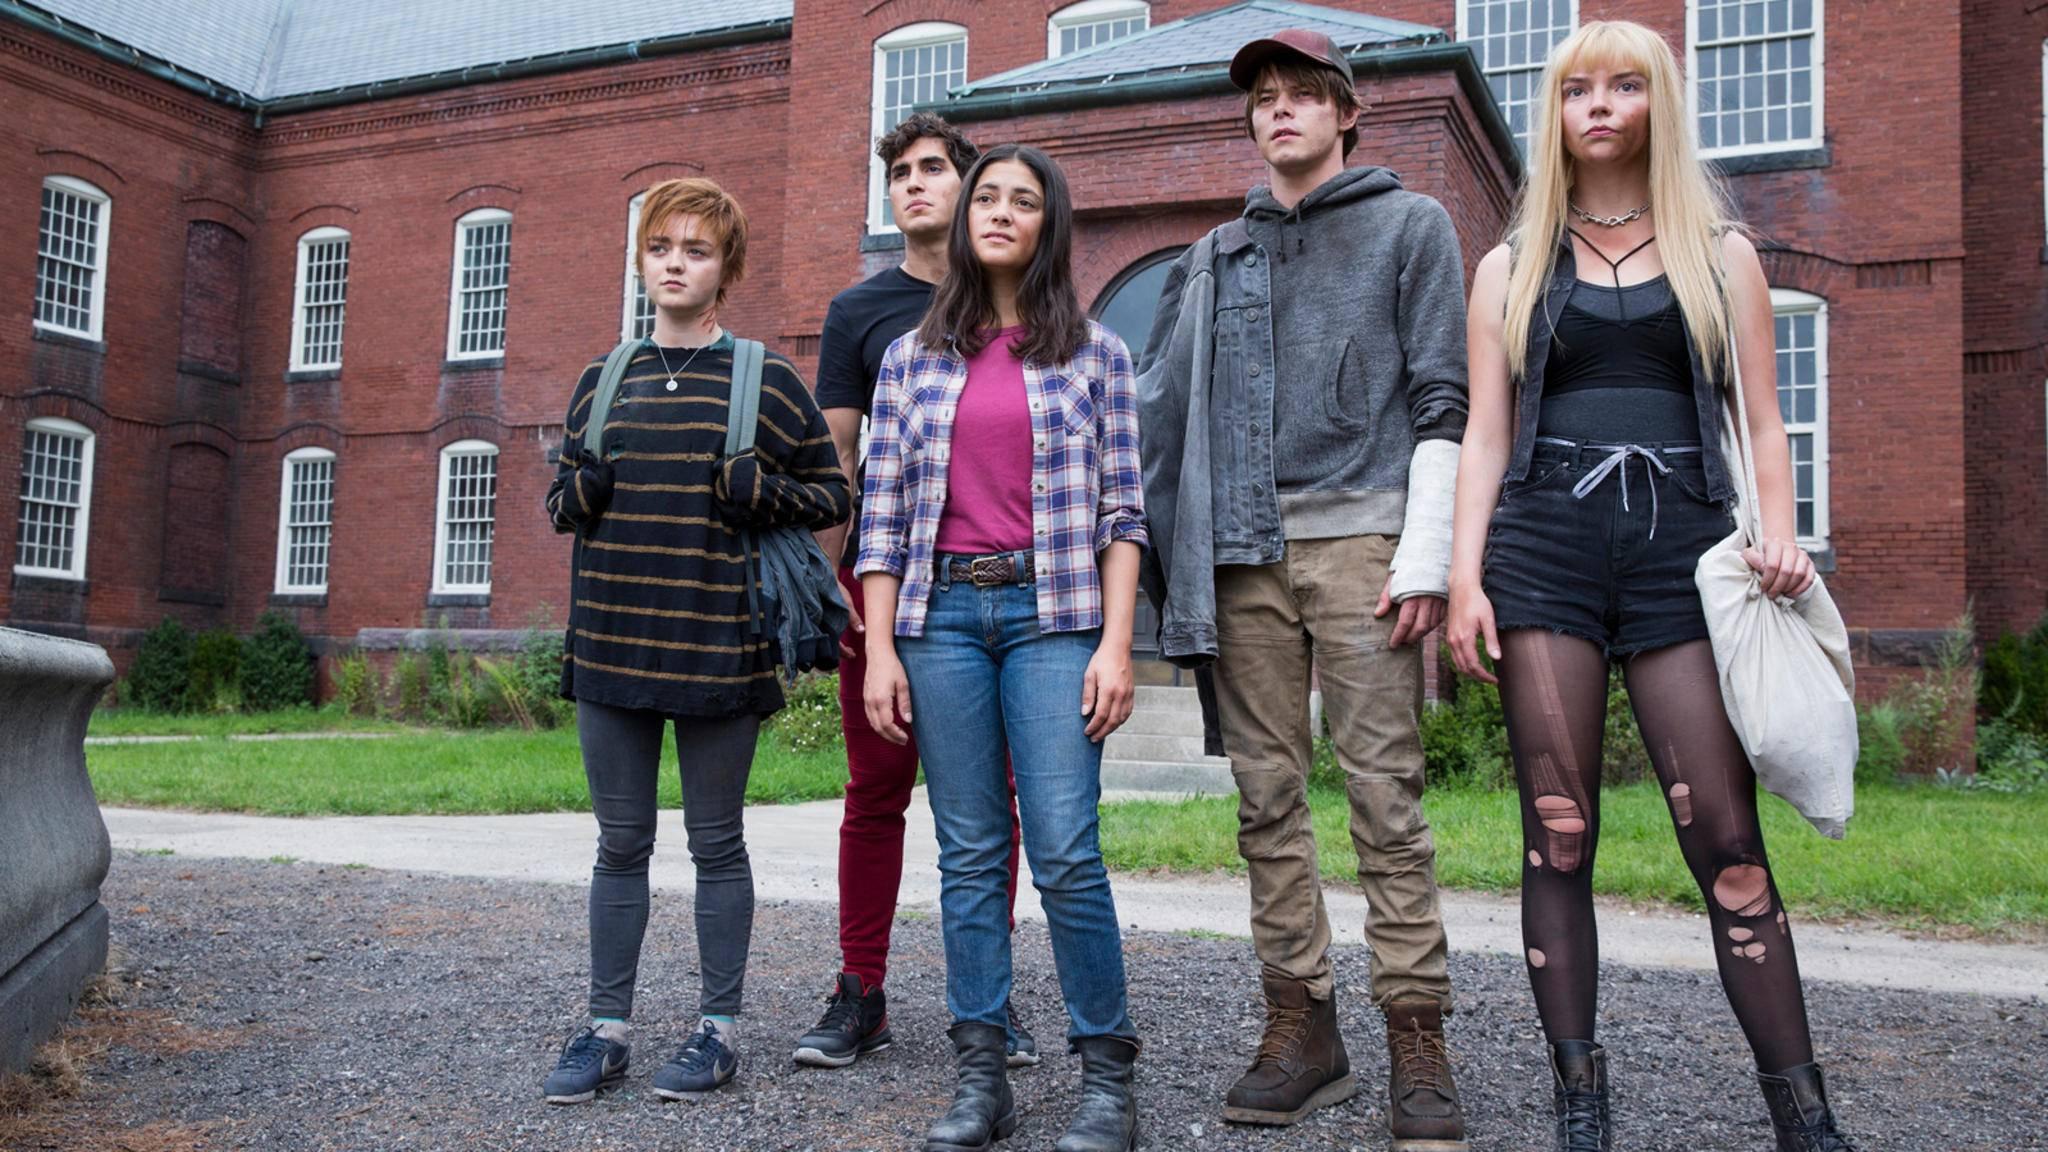 New Mutants: Maisie Williams, Henry Zaga, Blu Hunt, Charlie Heaton, Anya Taylor-Joy